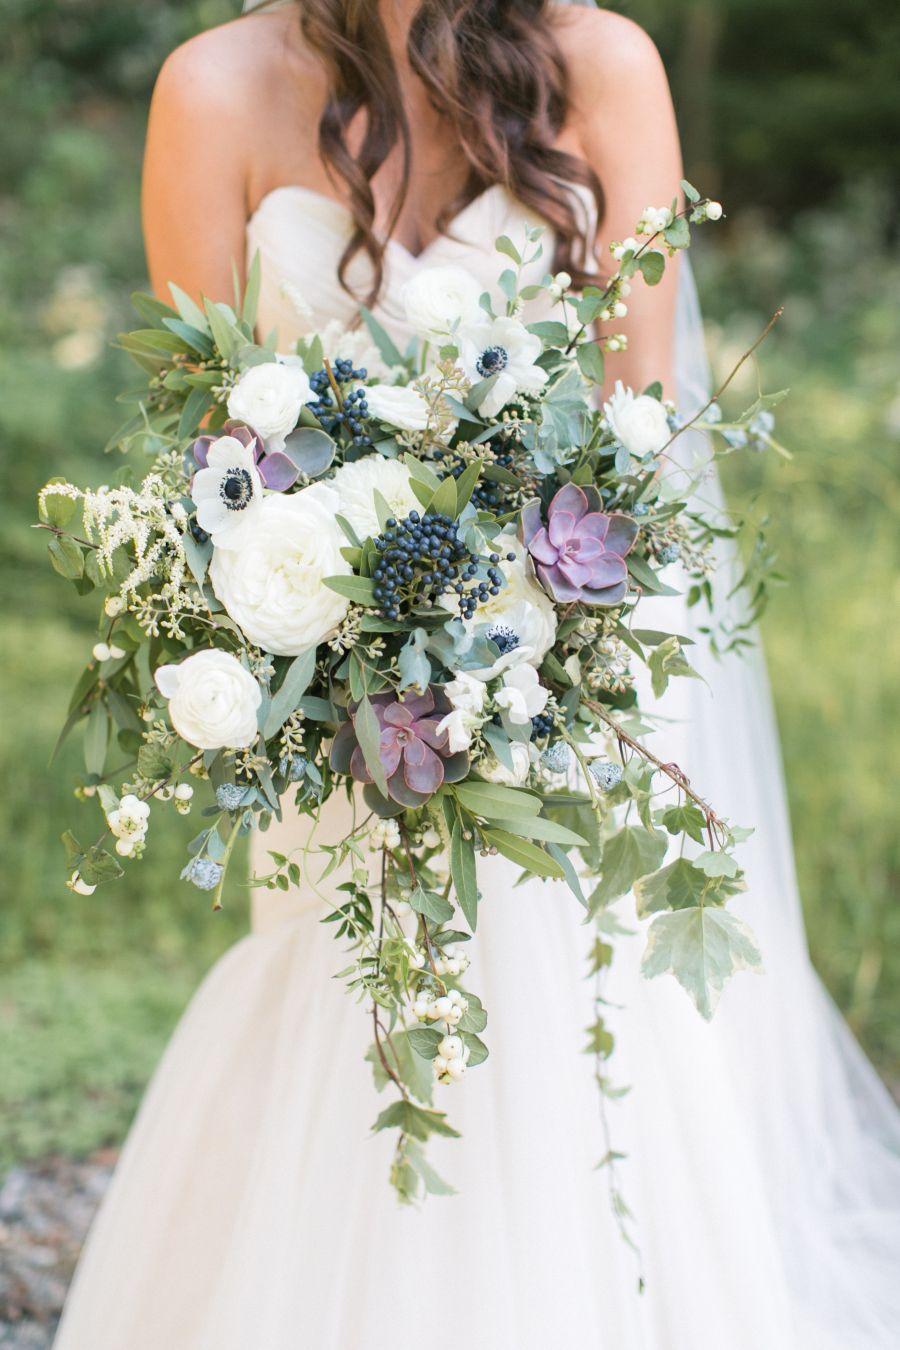 A Whimsical Farm Wedding for MeanttoBe Lovebirds